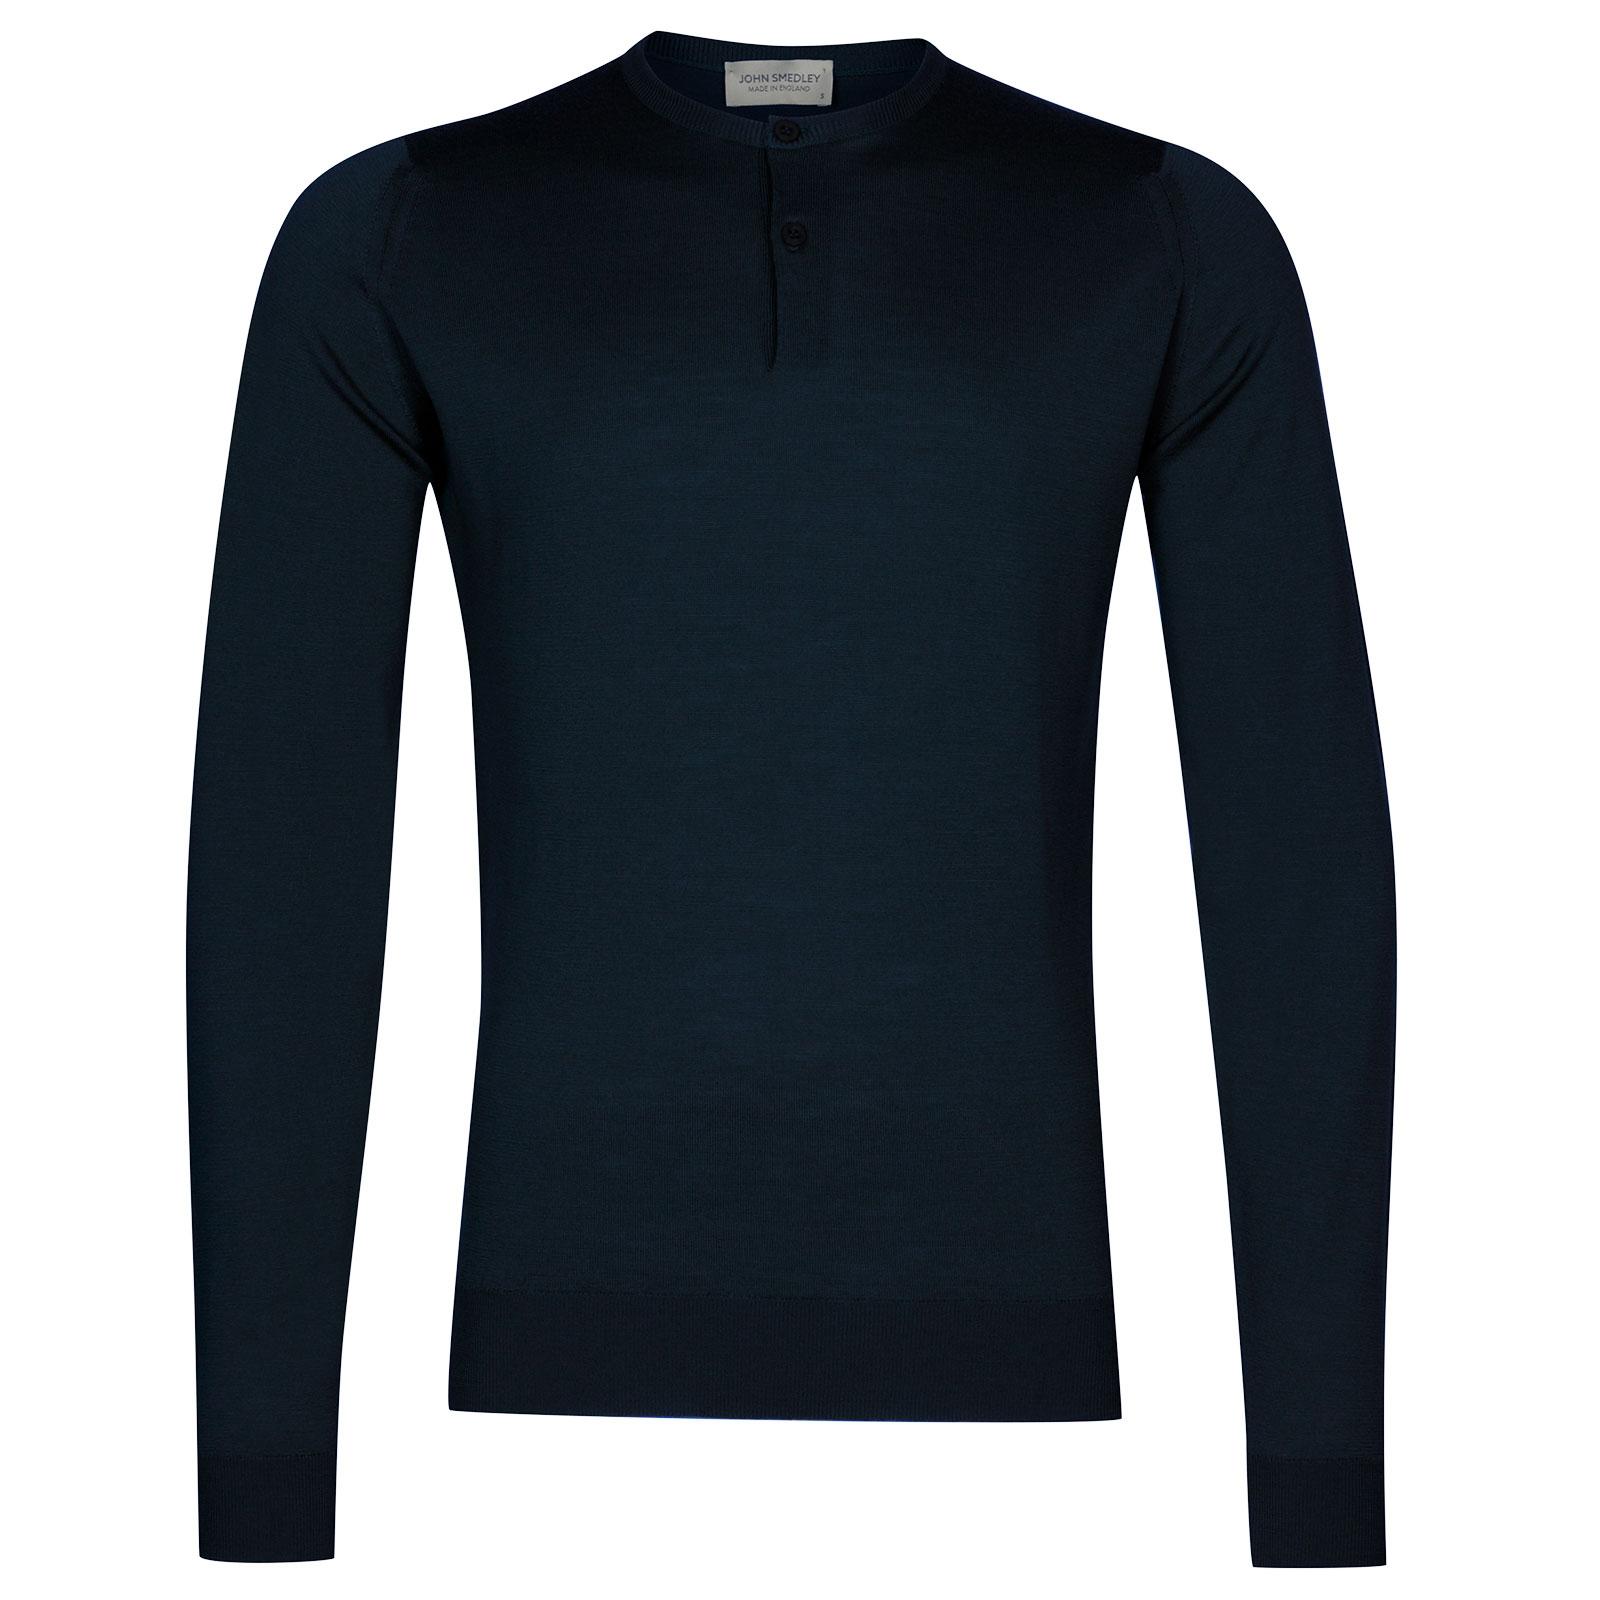 John Smedley Russet Merino Wool Henley Shirt in Orion Green-XXL